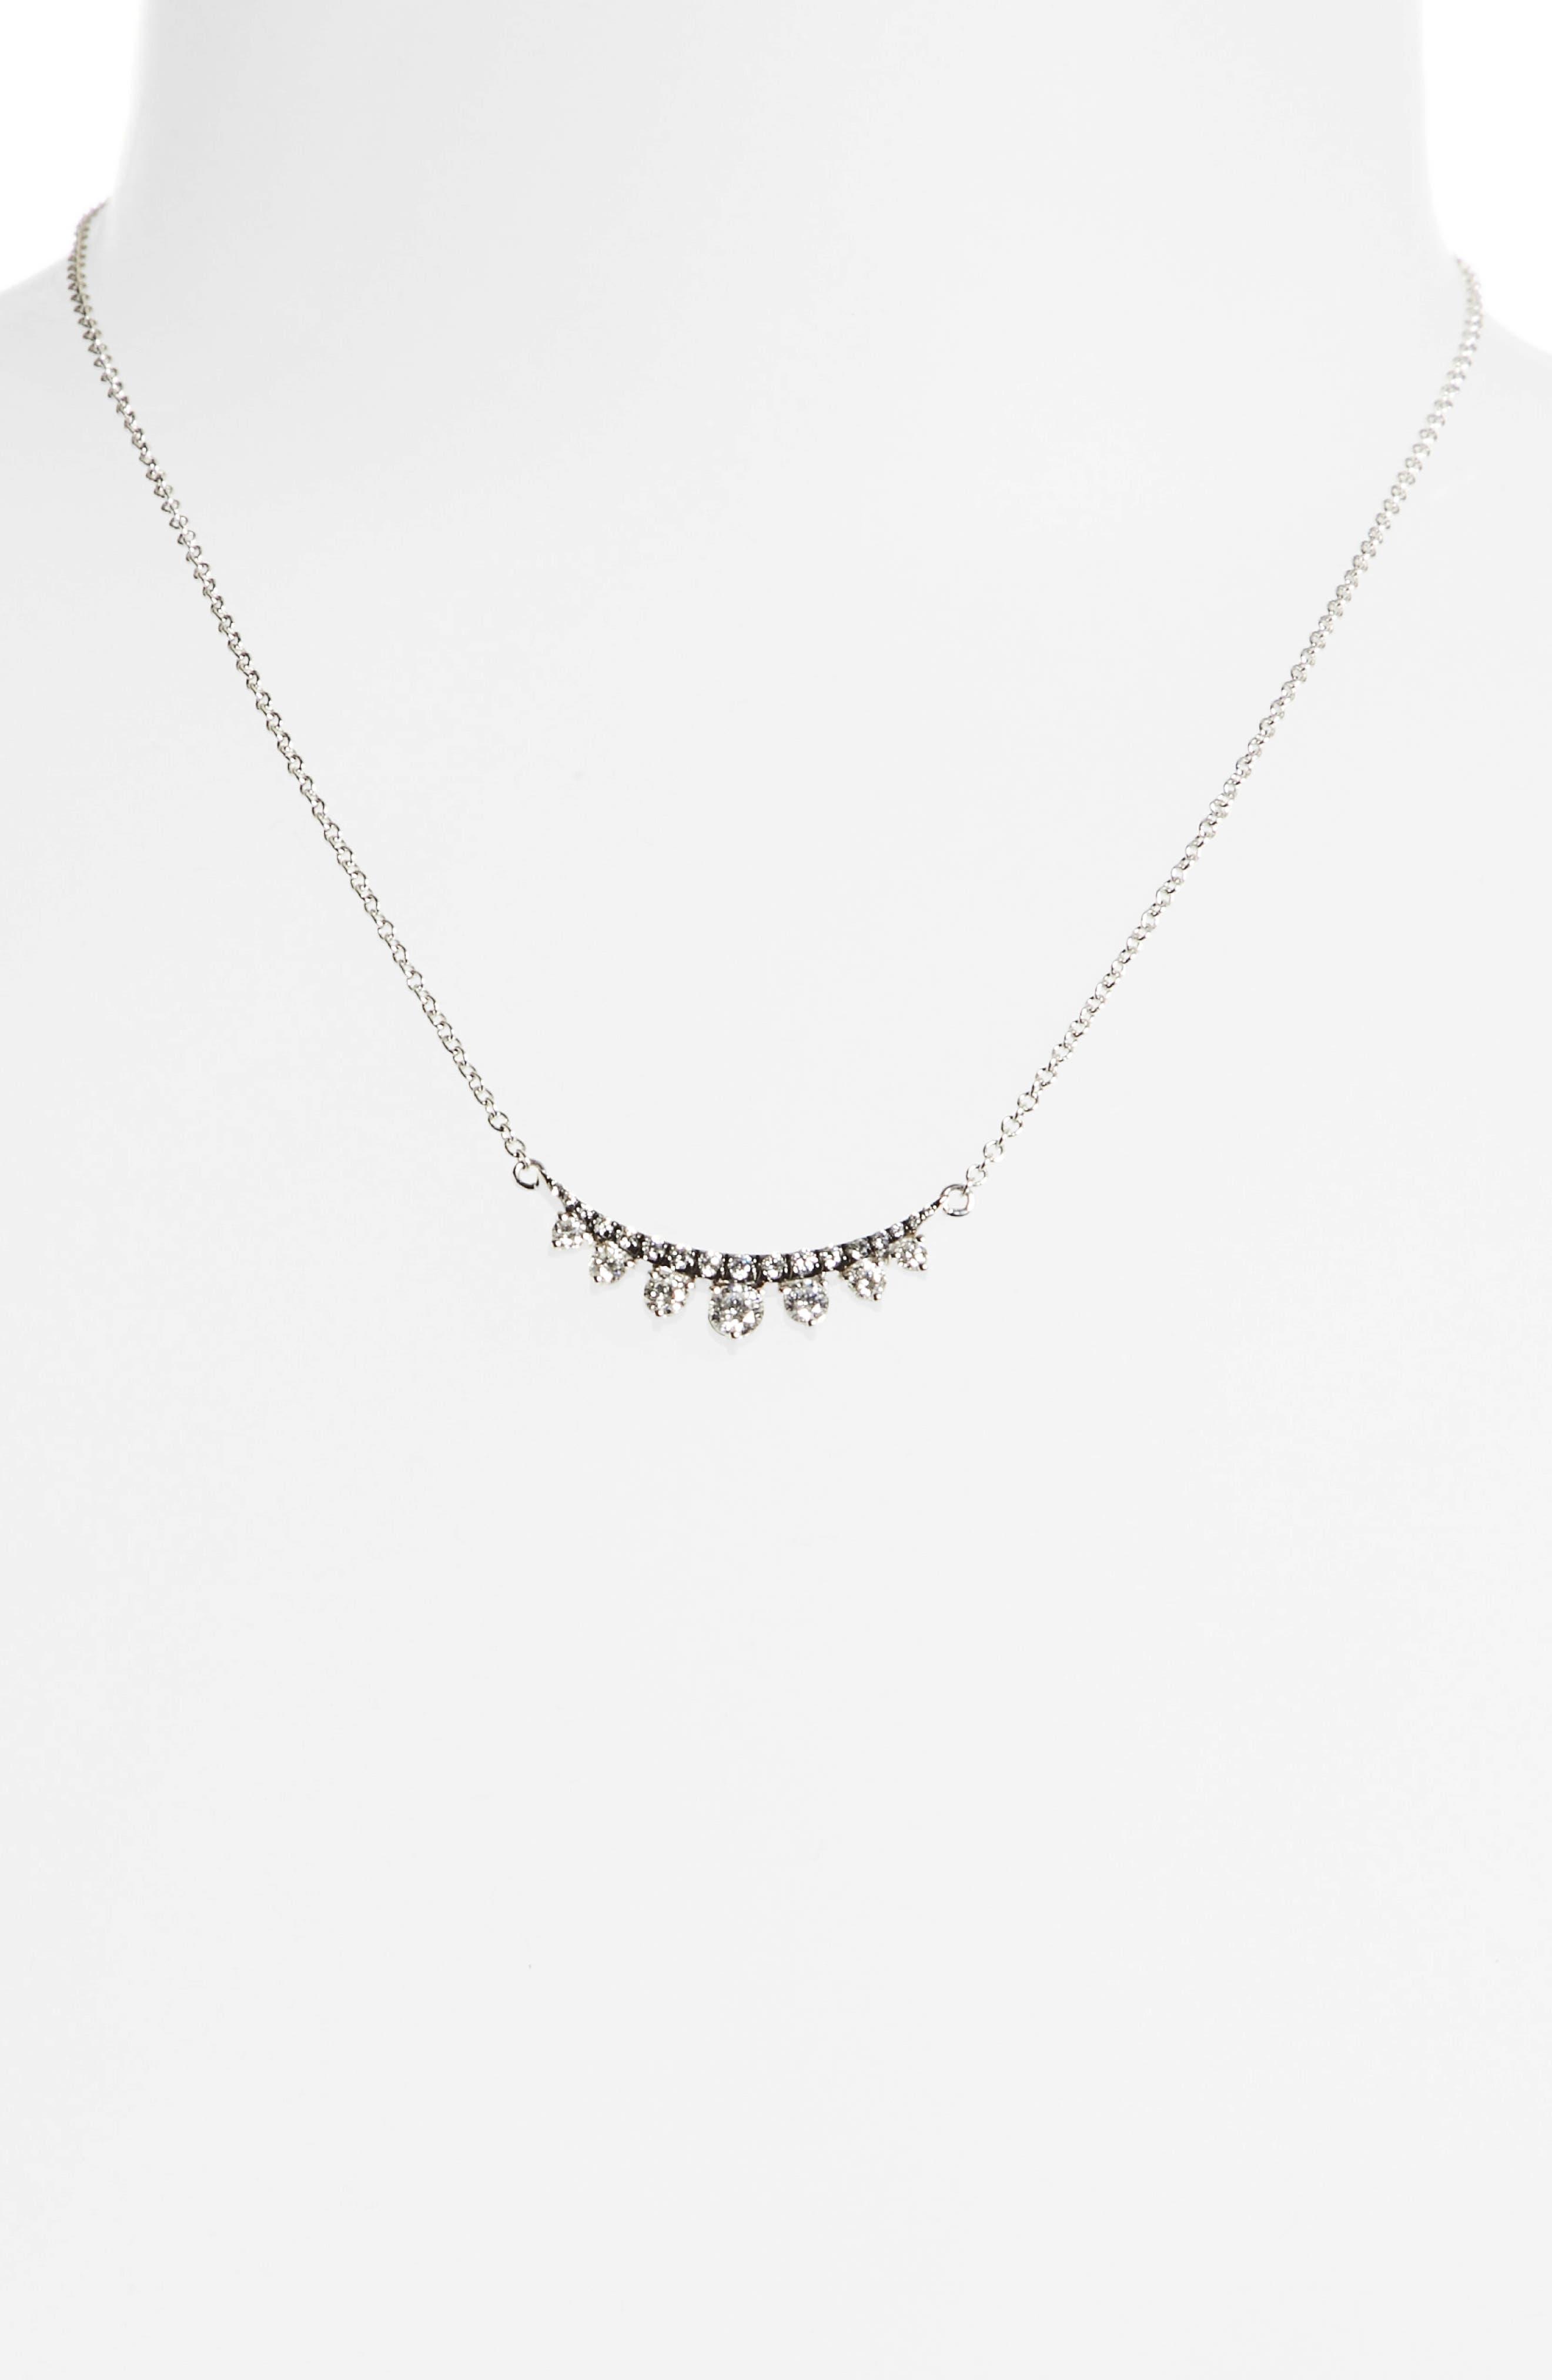 Prive Luxe 18K White Gold & Diamond Necklace,                             Alternate thumbnail 2, color,                             DIAMOND/BLACK RHODIUM